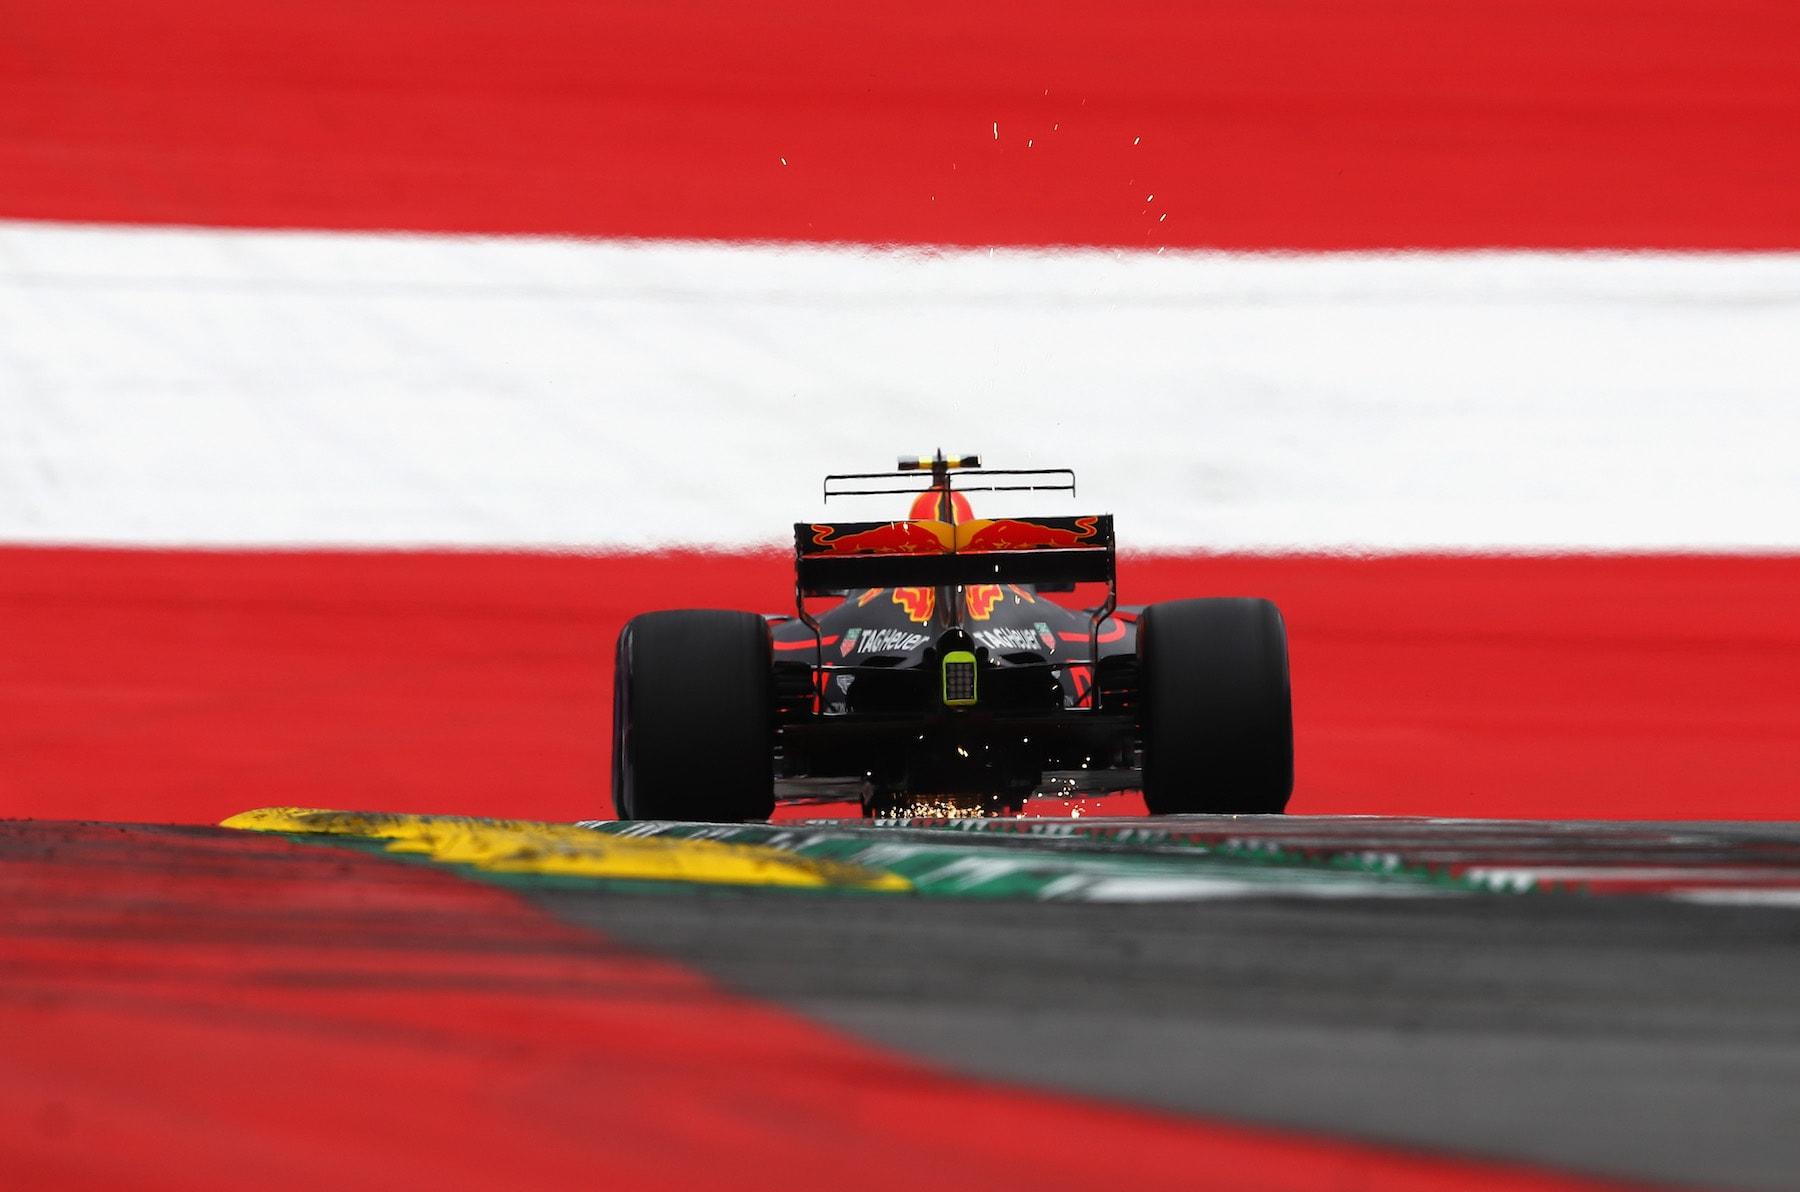 2017 Max Verstappen | Red Bull RB13 | 2017 Austrian GP Q 1 copy.jpg